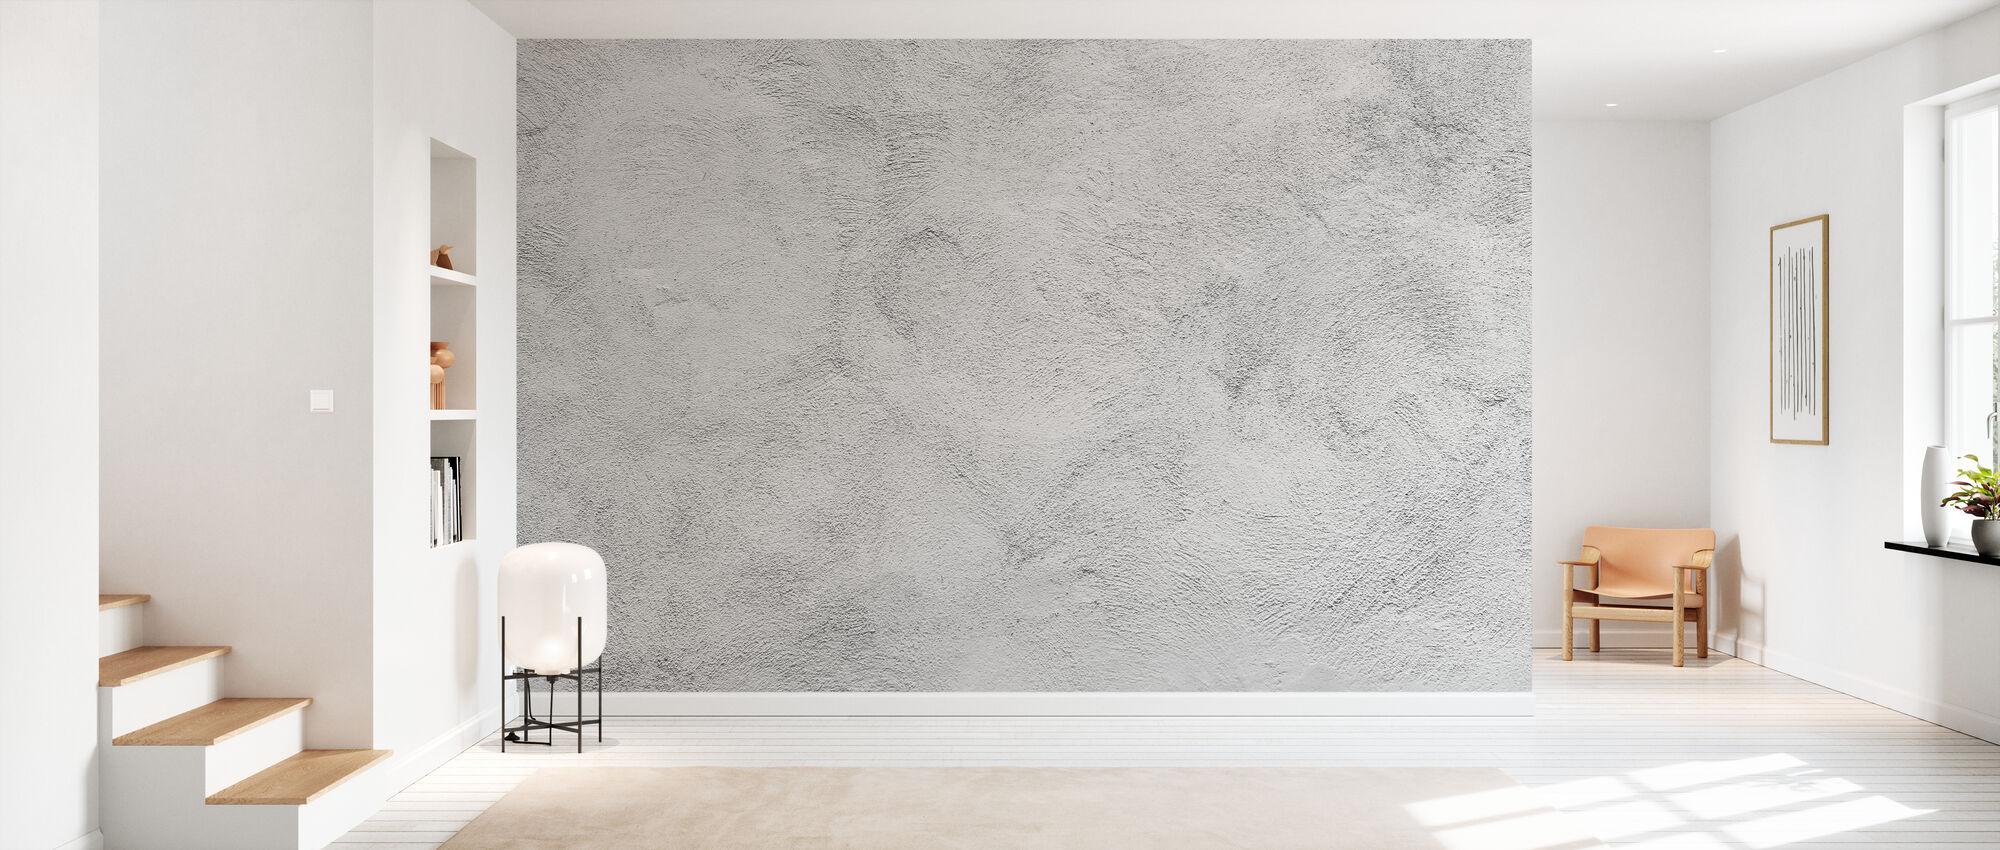 White Washed Concrete - Wallpaper - Hallway